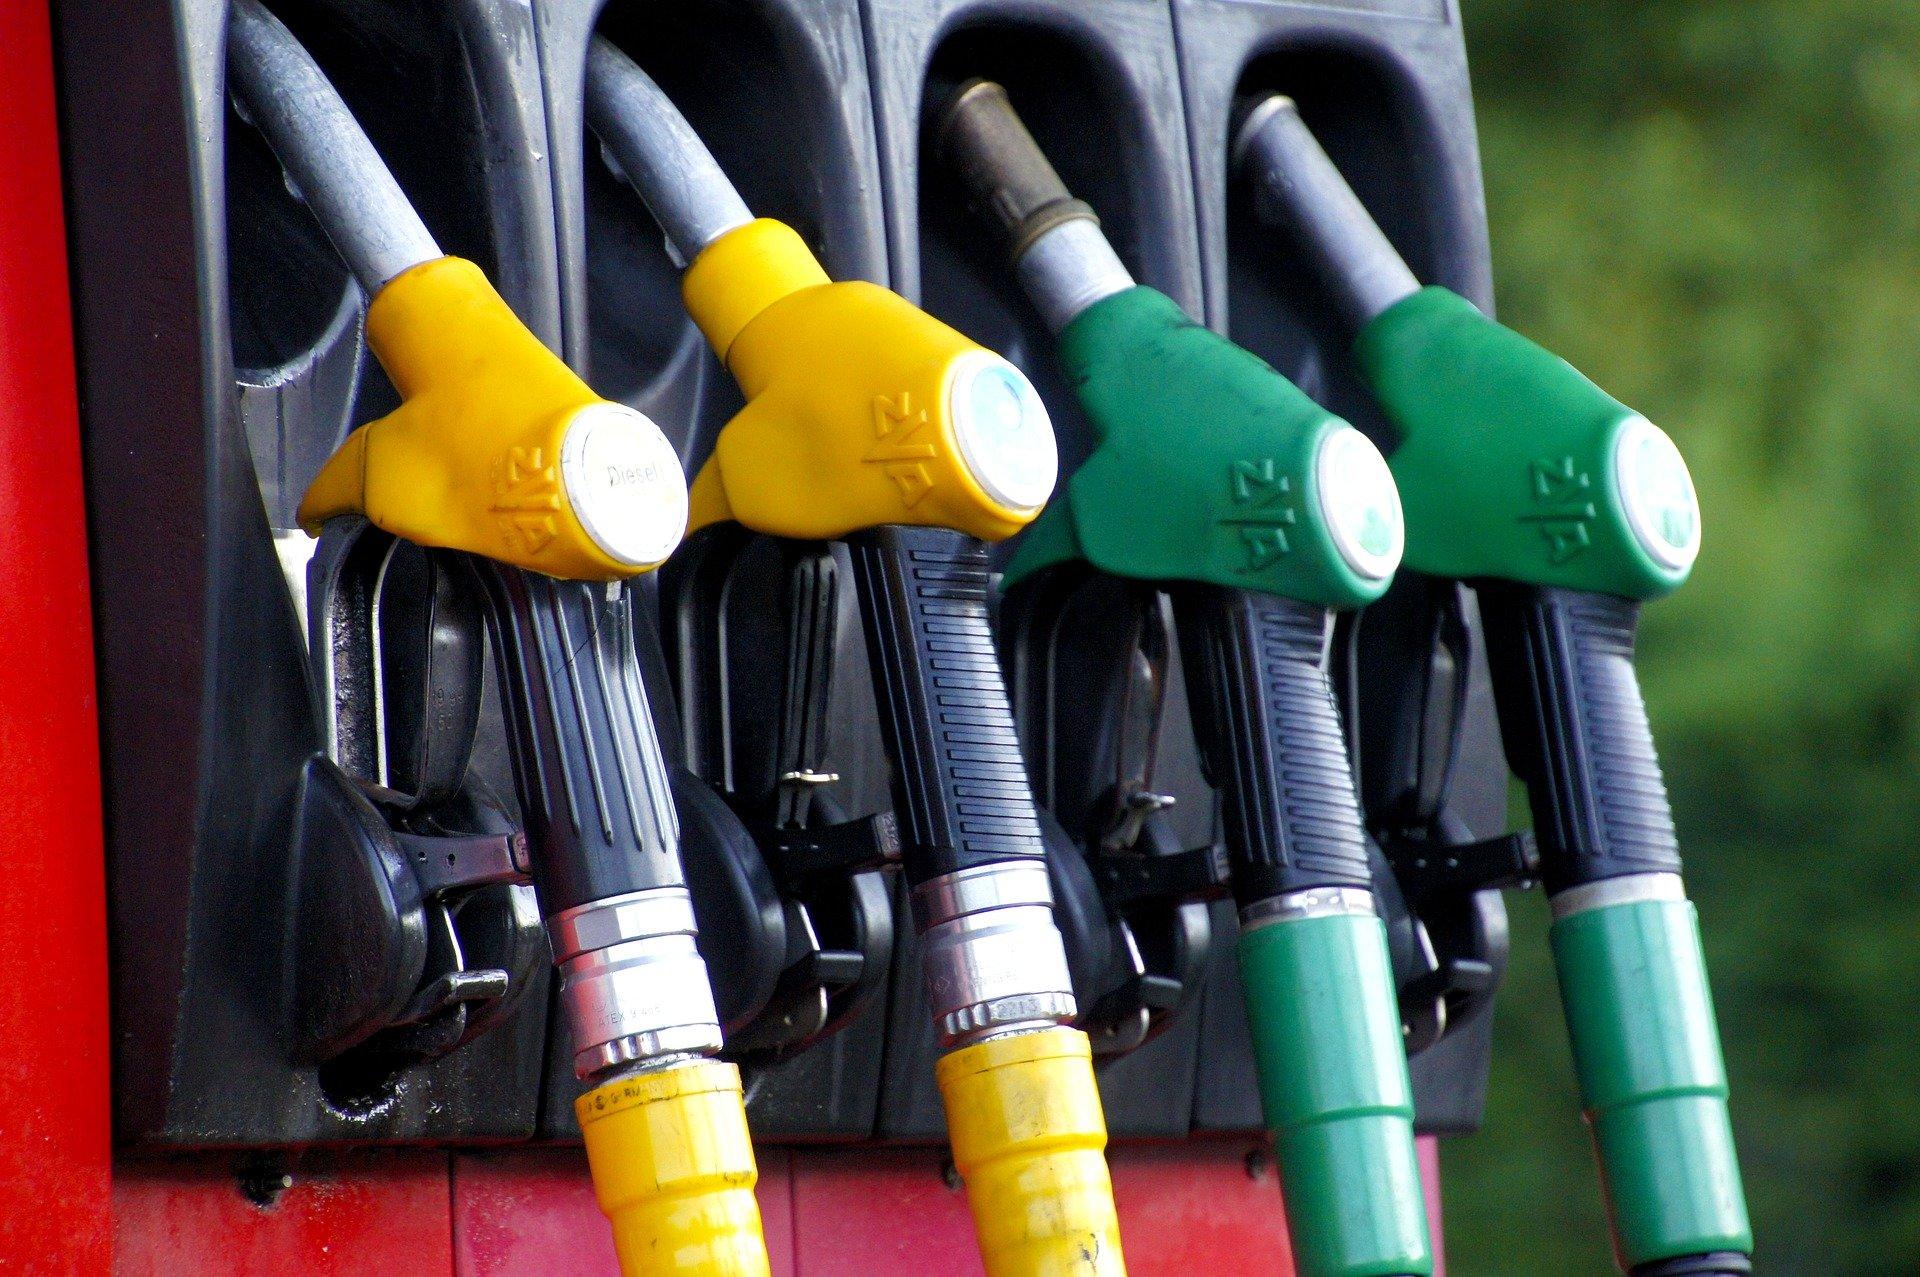 Alaska Motor Fuel Excise Tax Bond